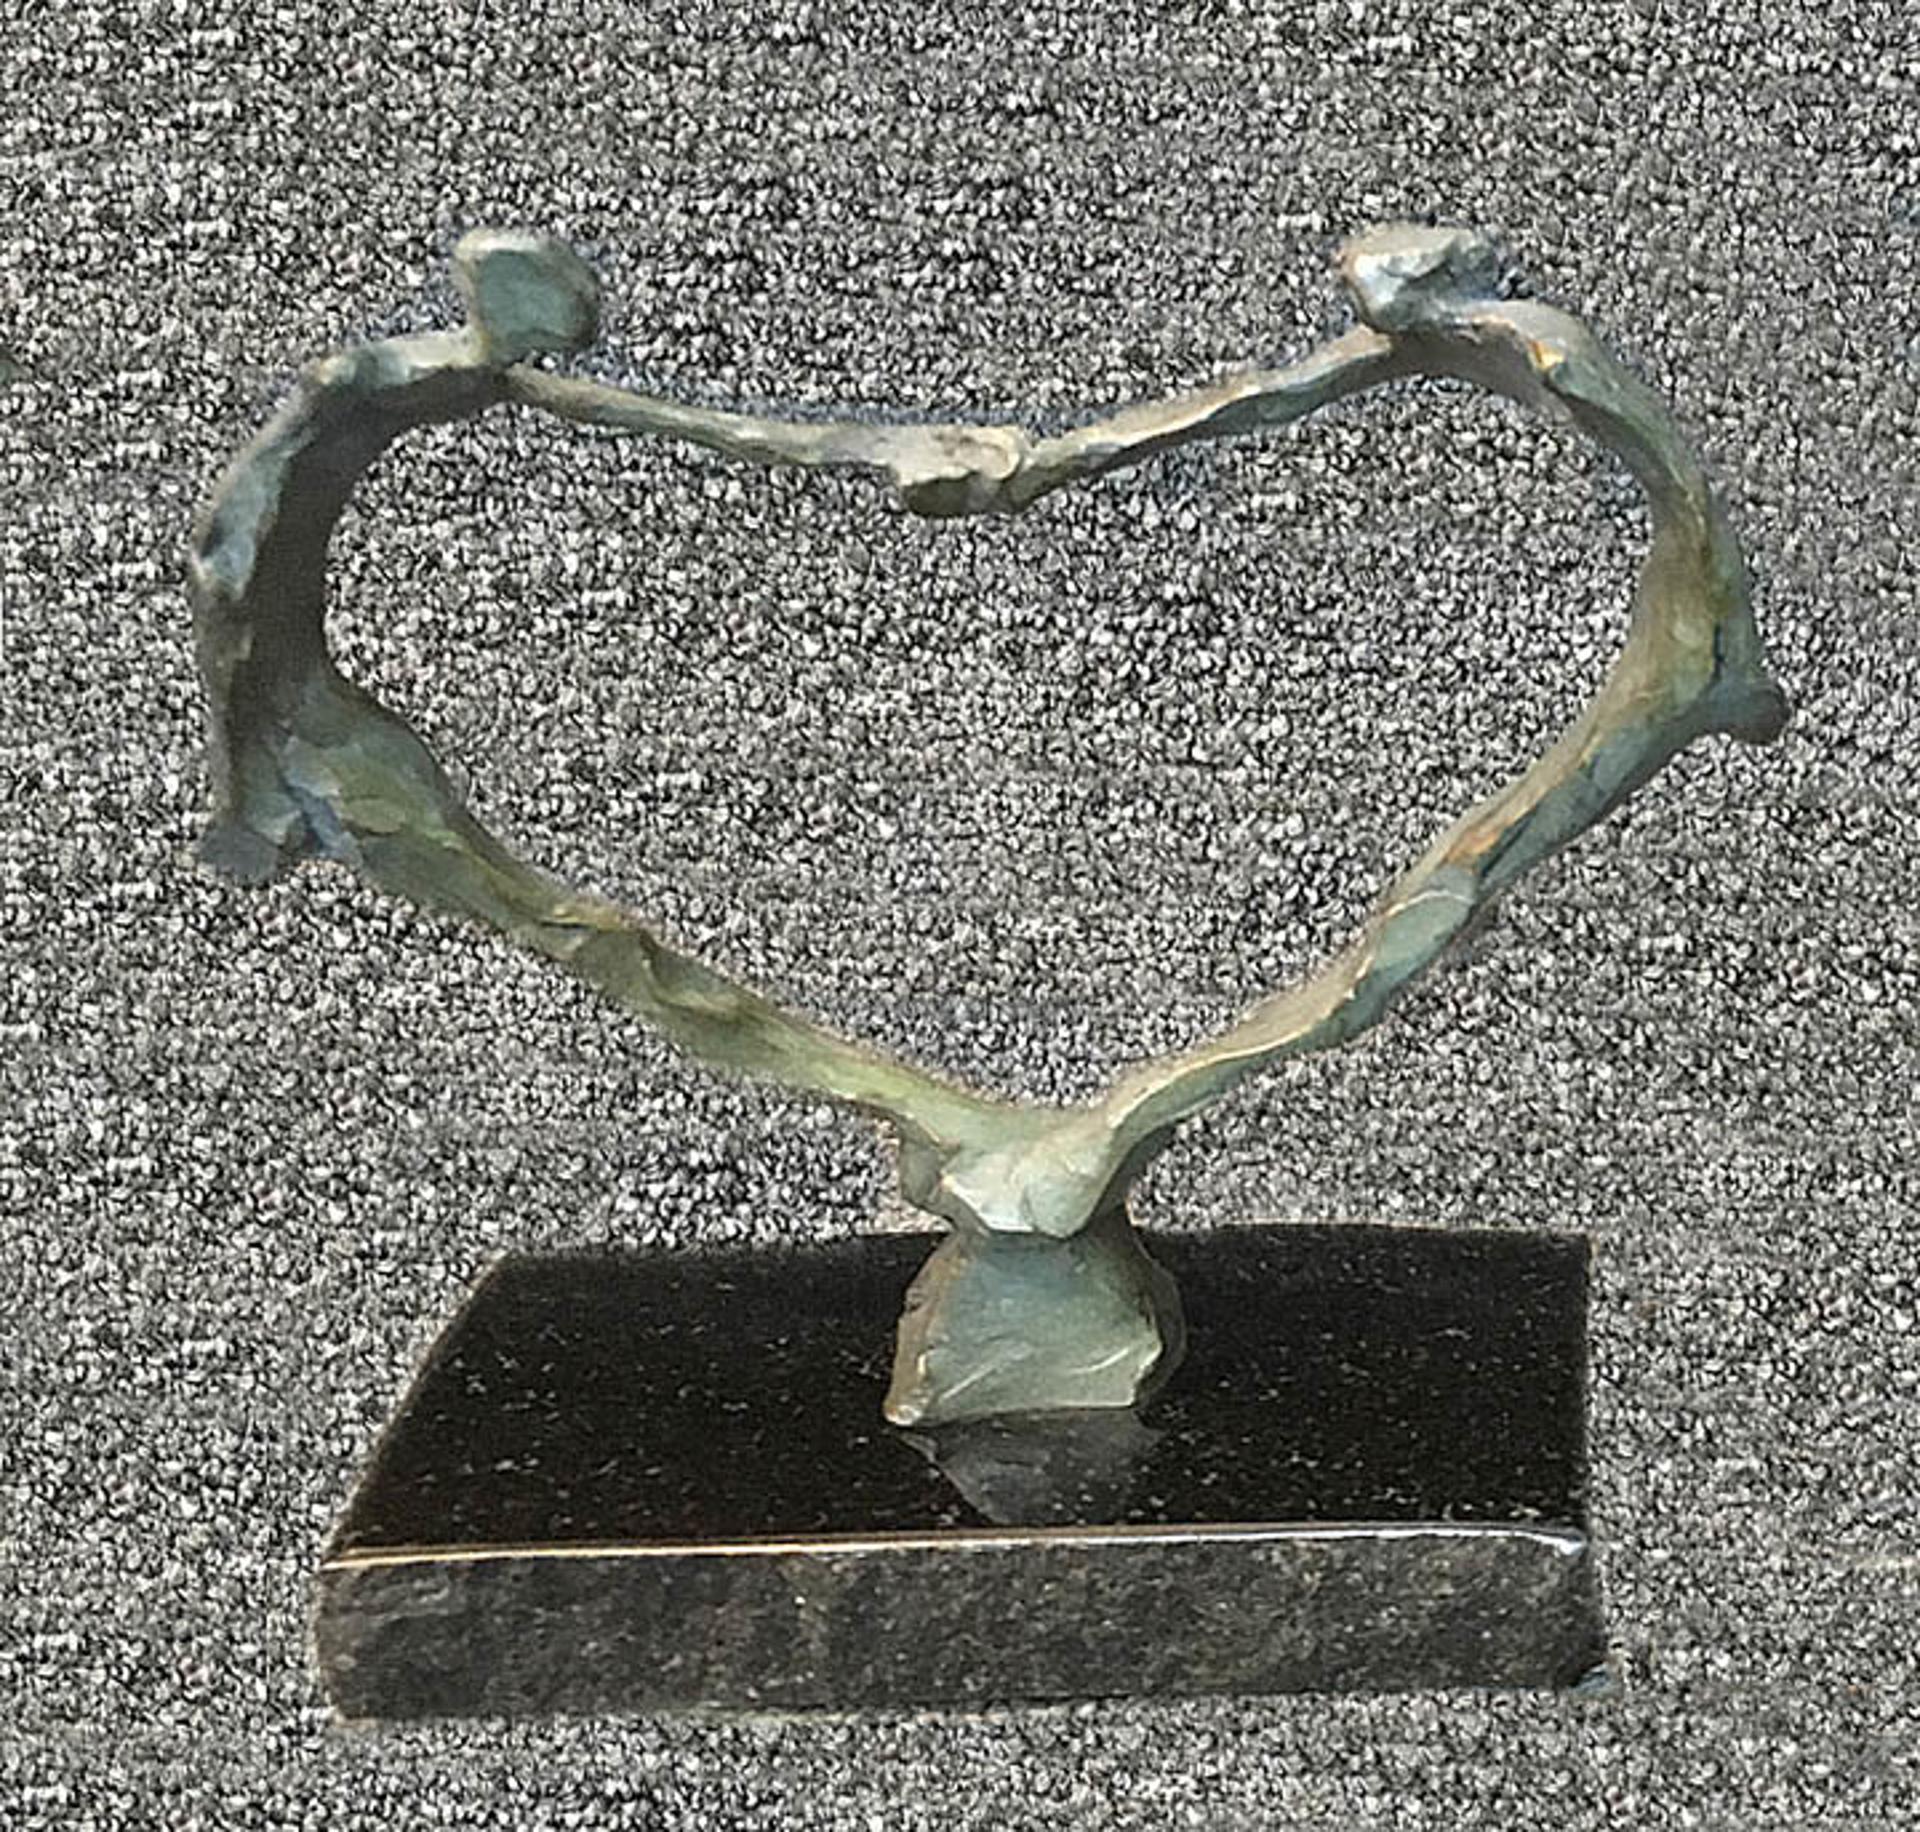 My Heart is in Your Hands by Jane DeDecker